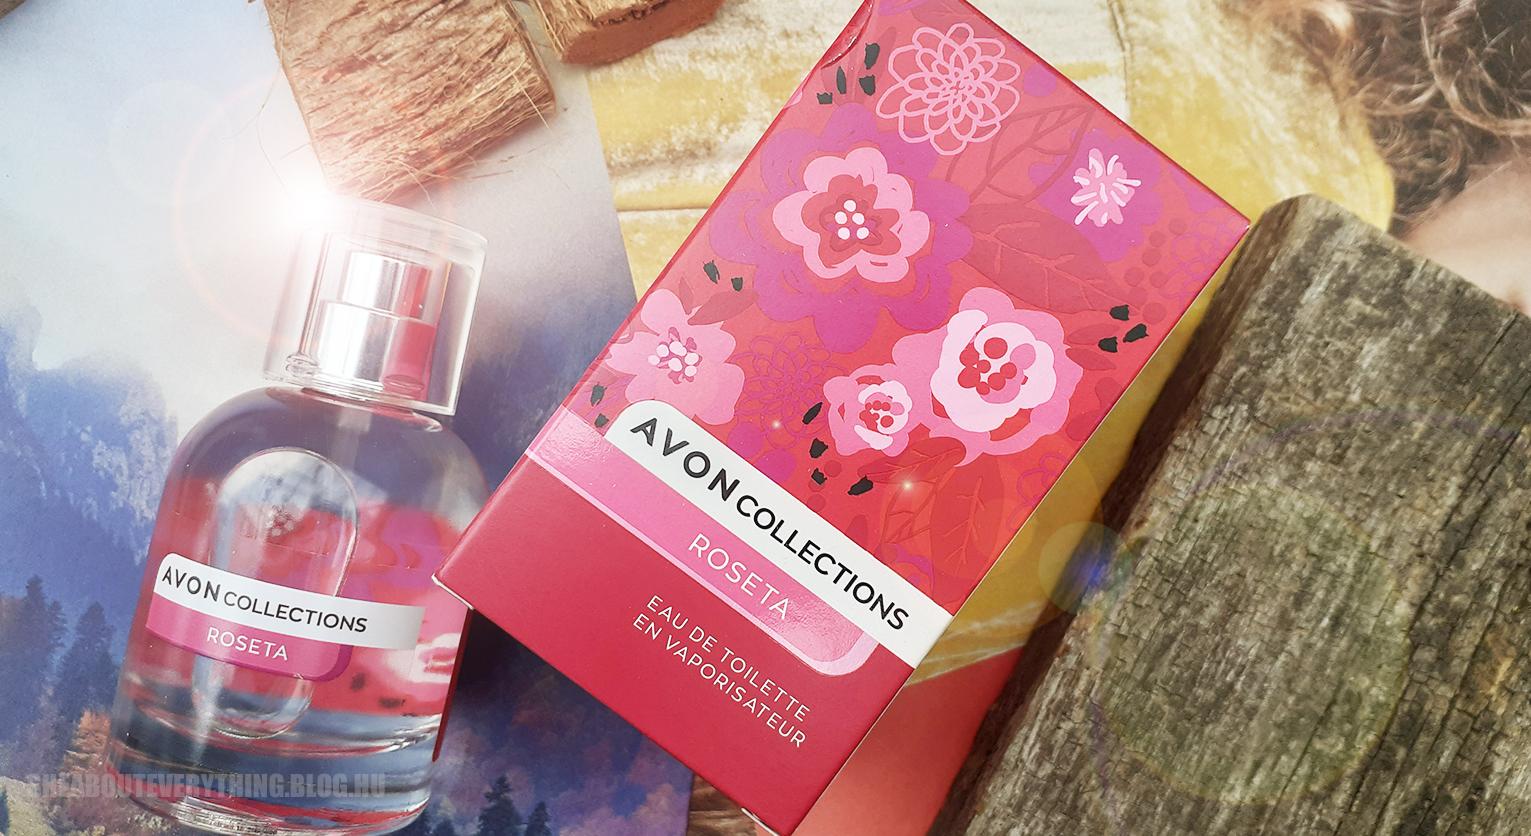 avon-collection-fragrance-9.jpg